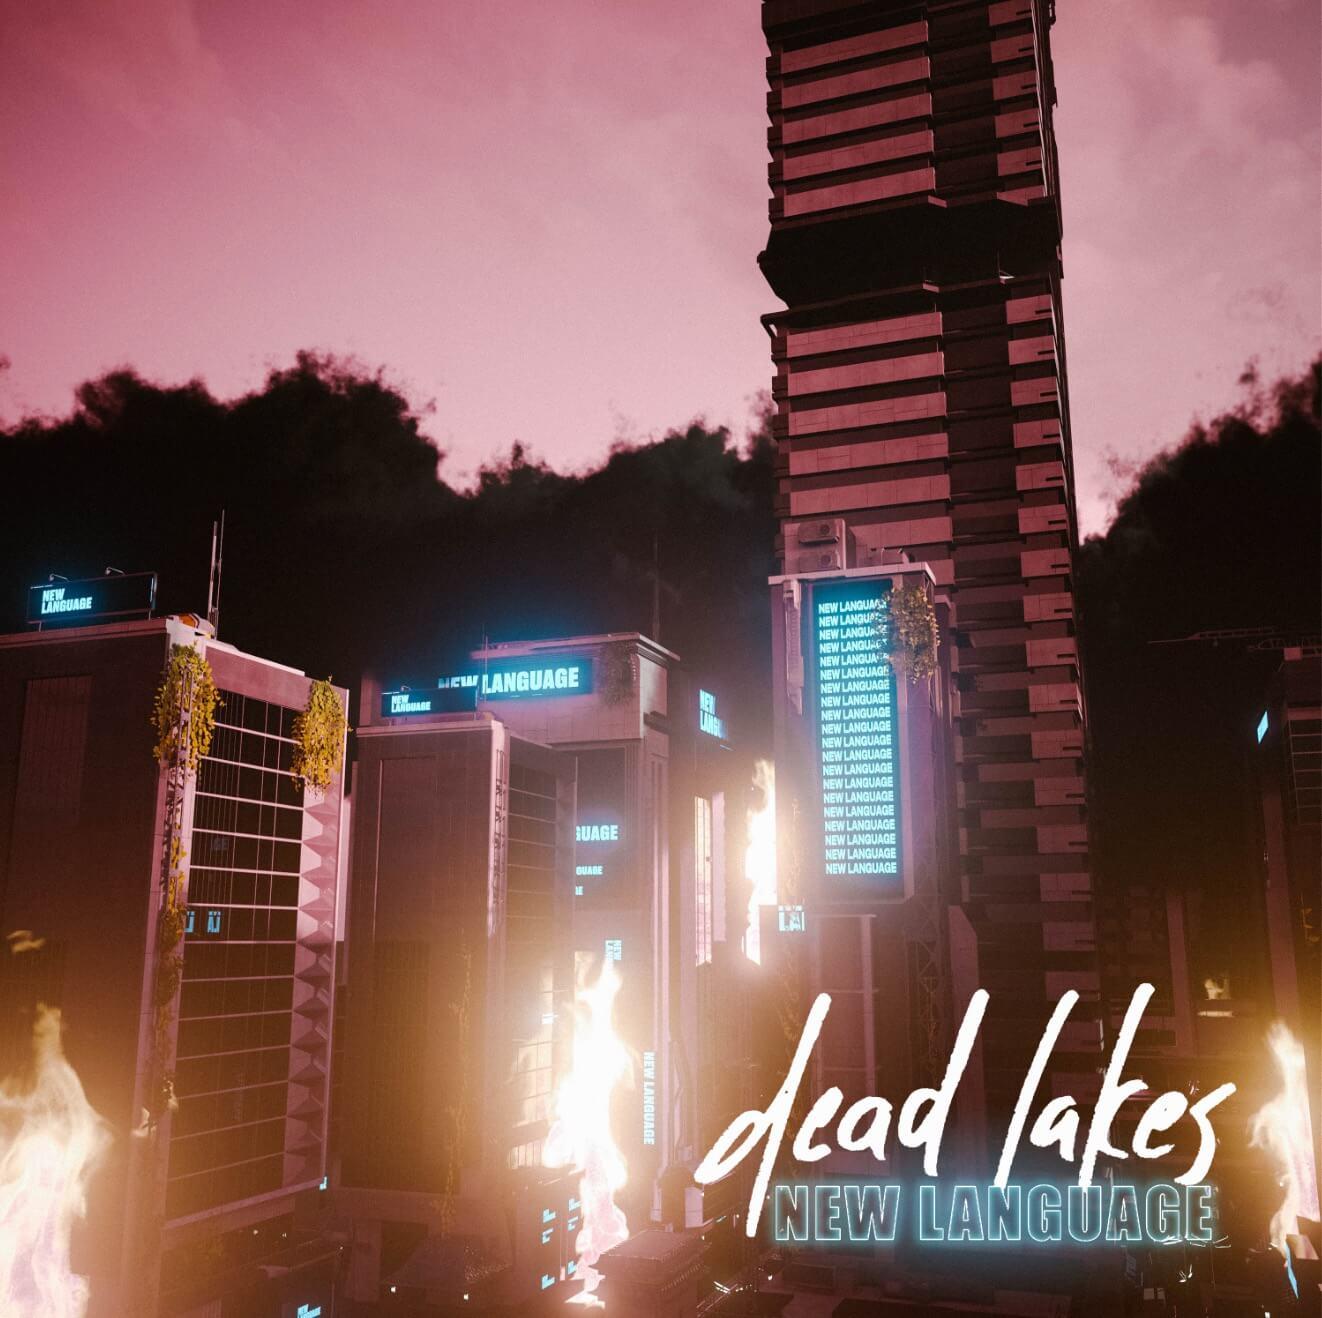 Dead Lakes New Language